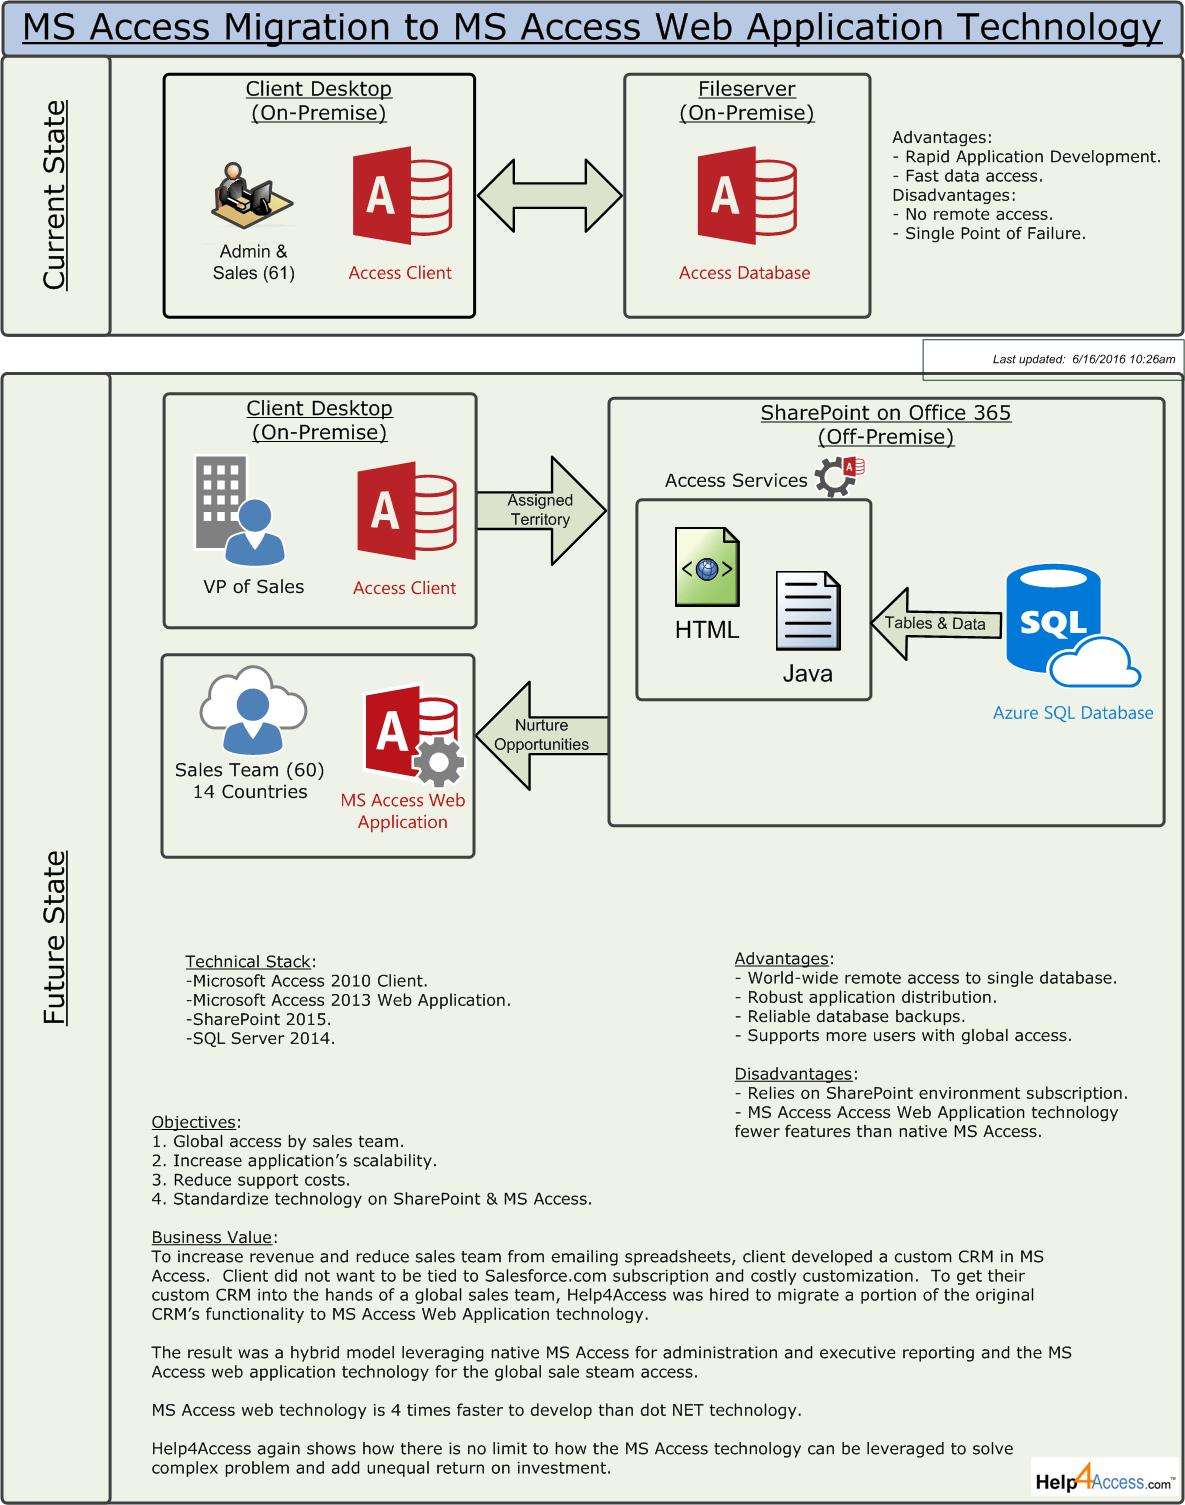 Microsoft Access Migration Strategy